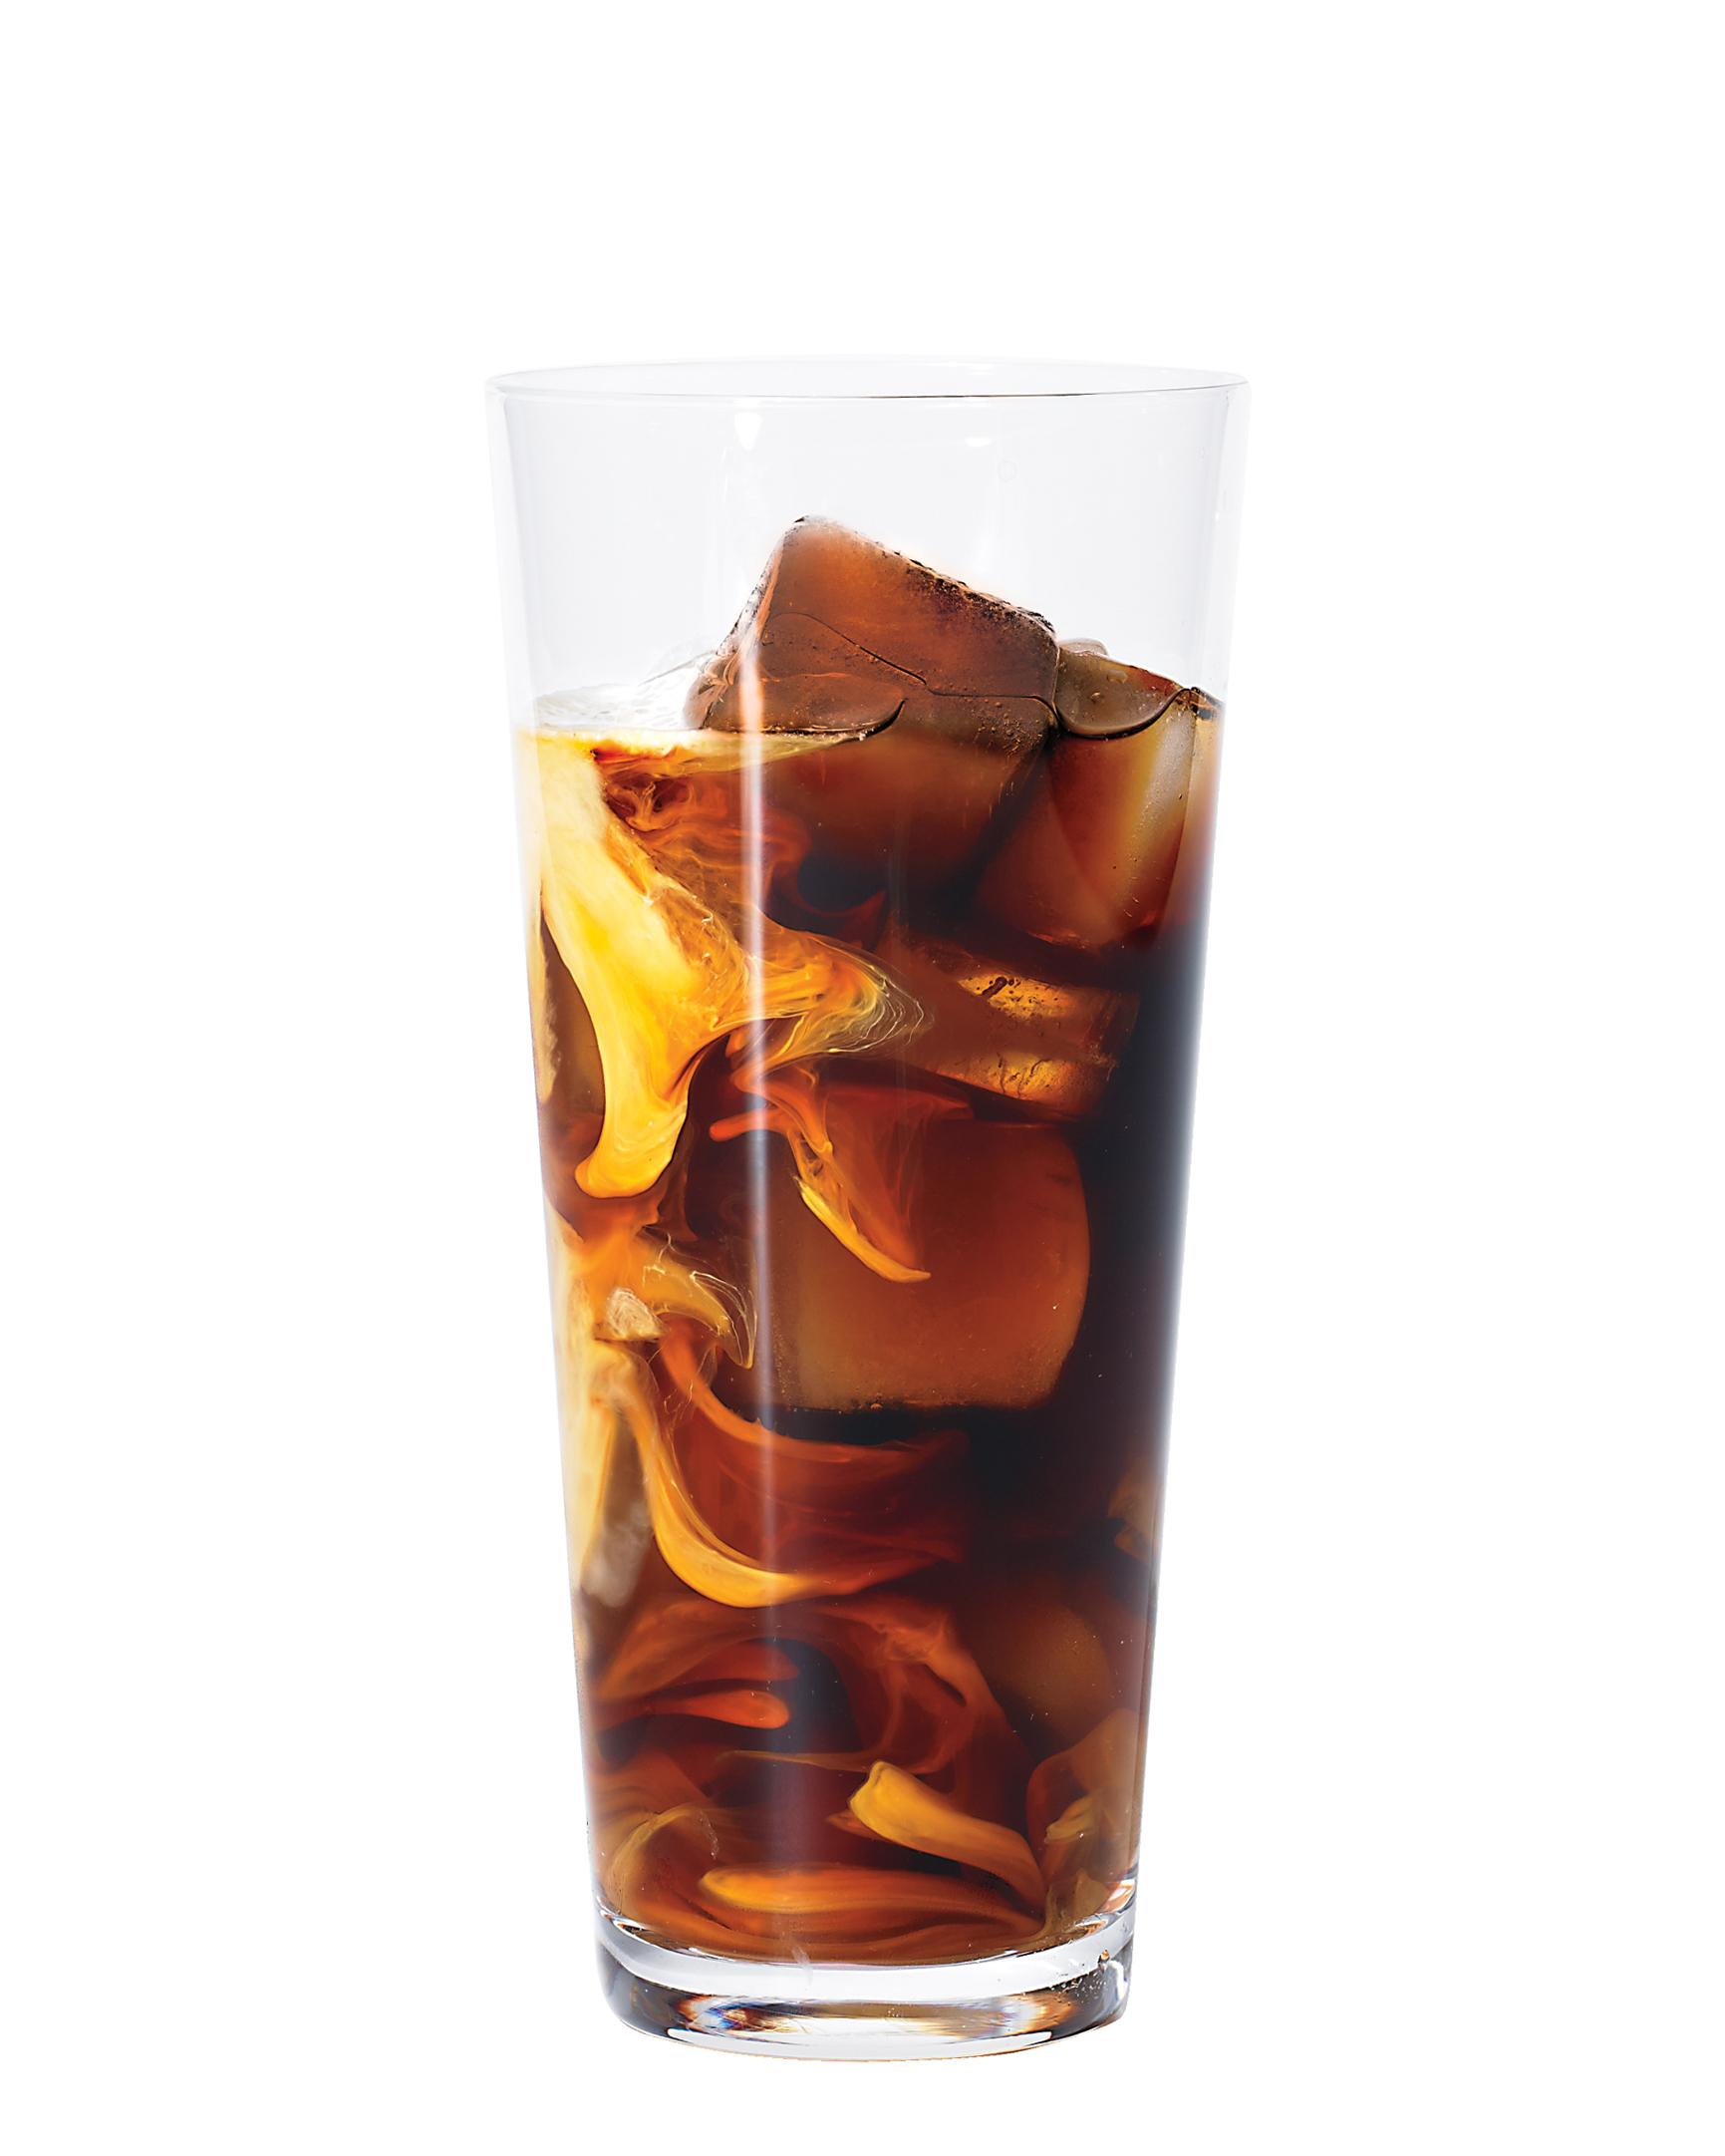 Iced-Coffee Upgrade